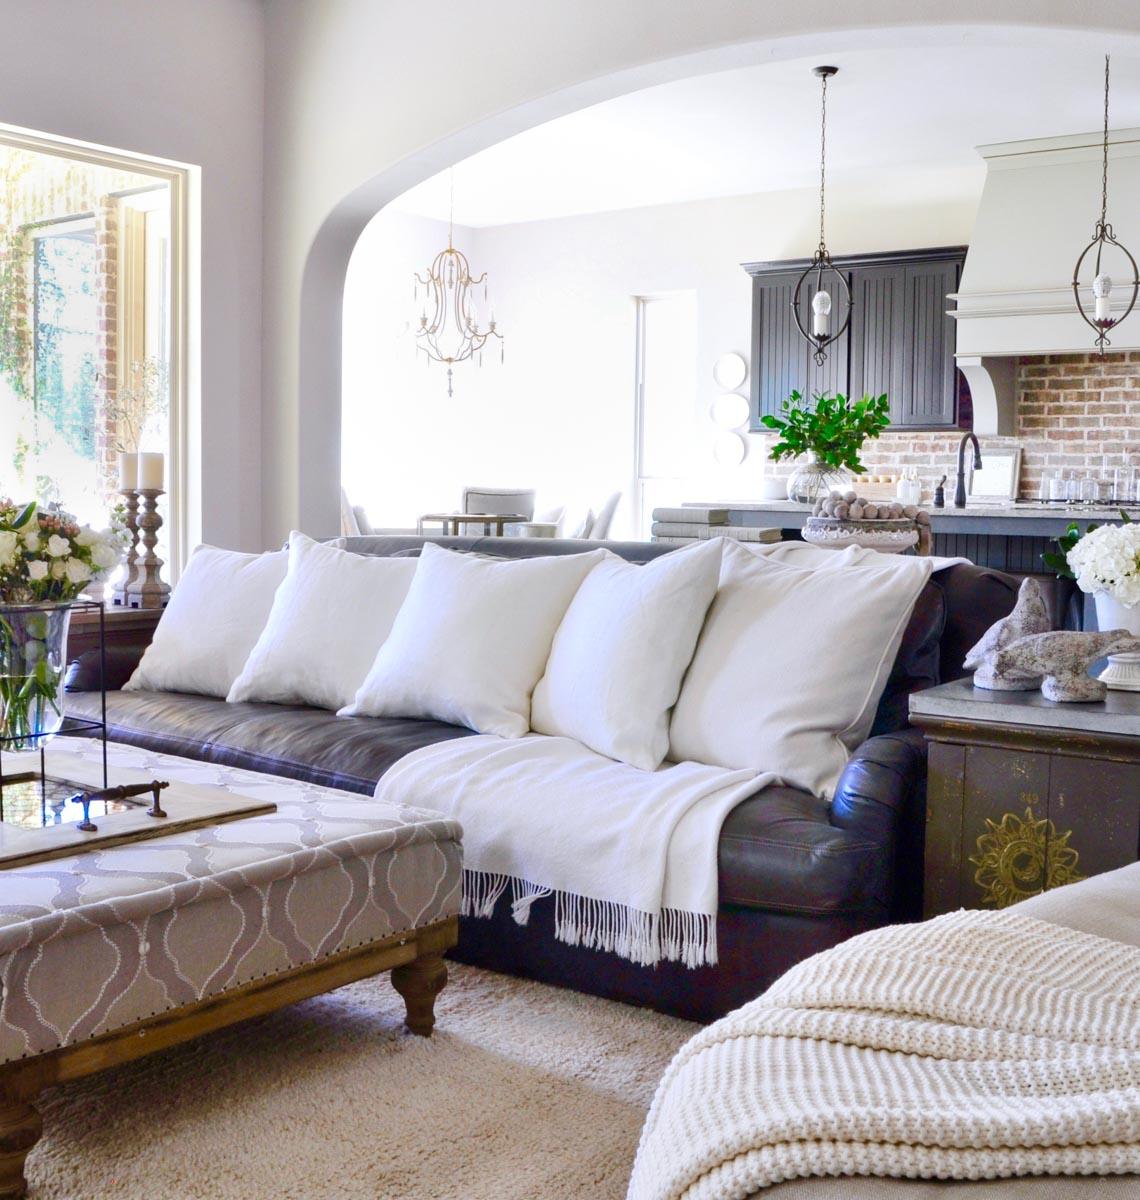 furnishings decor gold designs